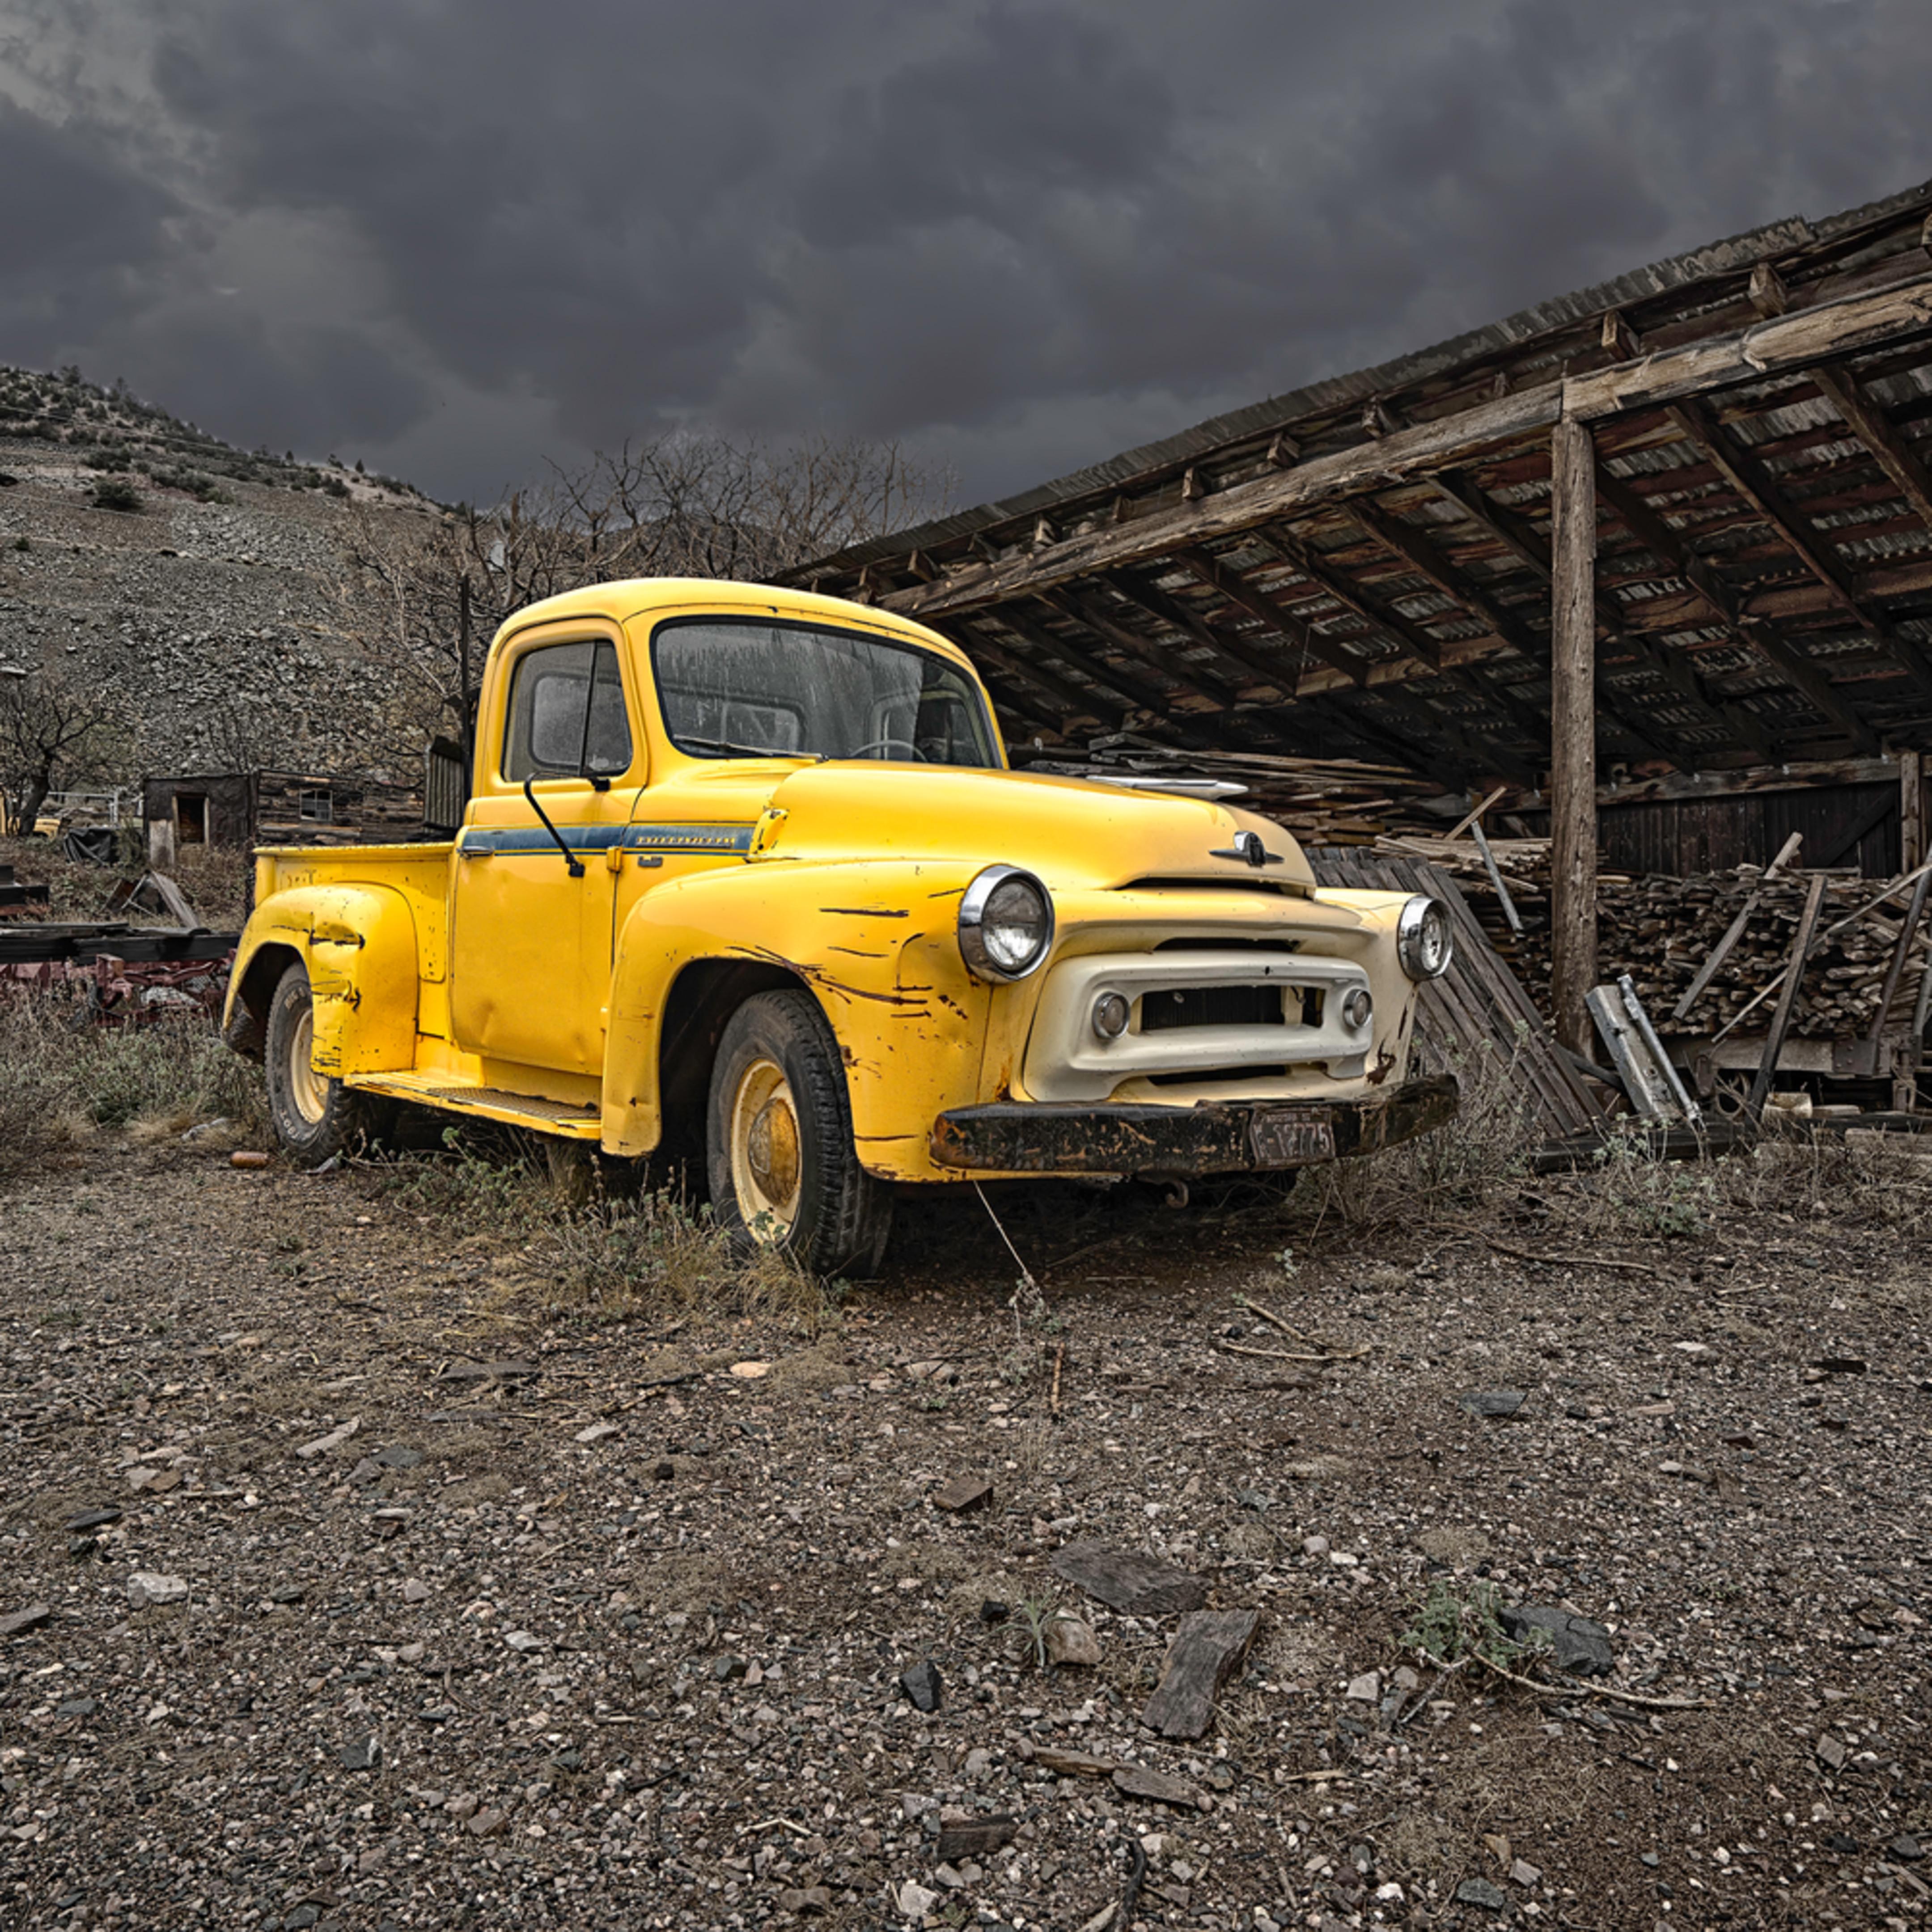 The old arizona gole mine truck vyxt7p